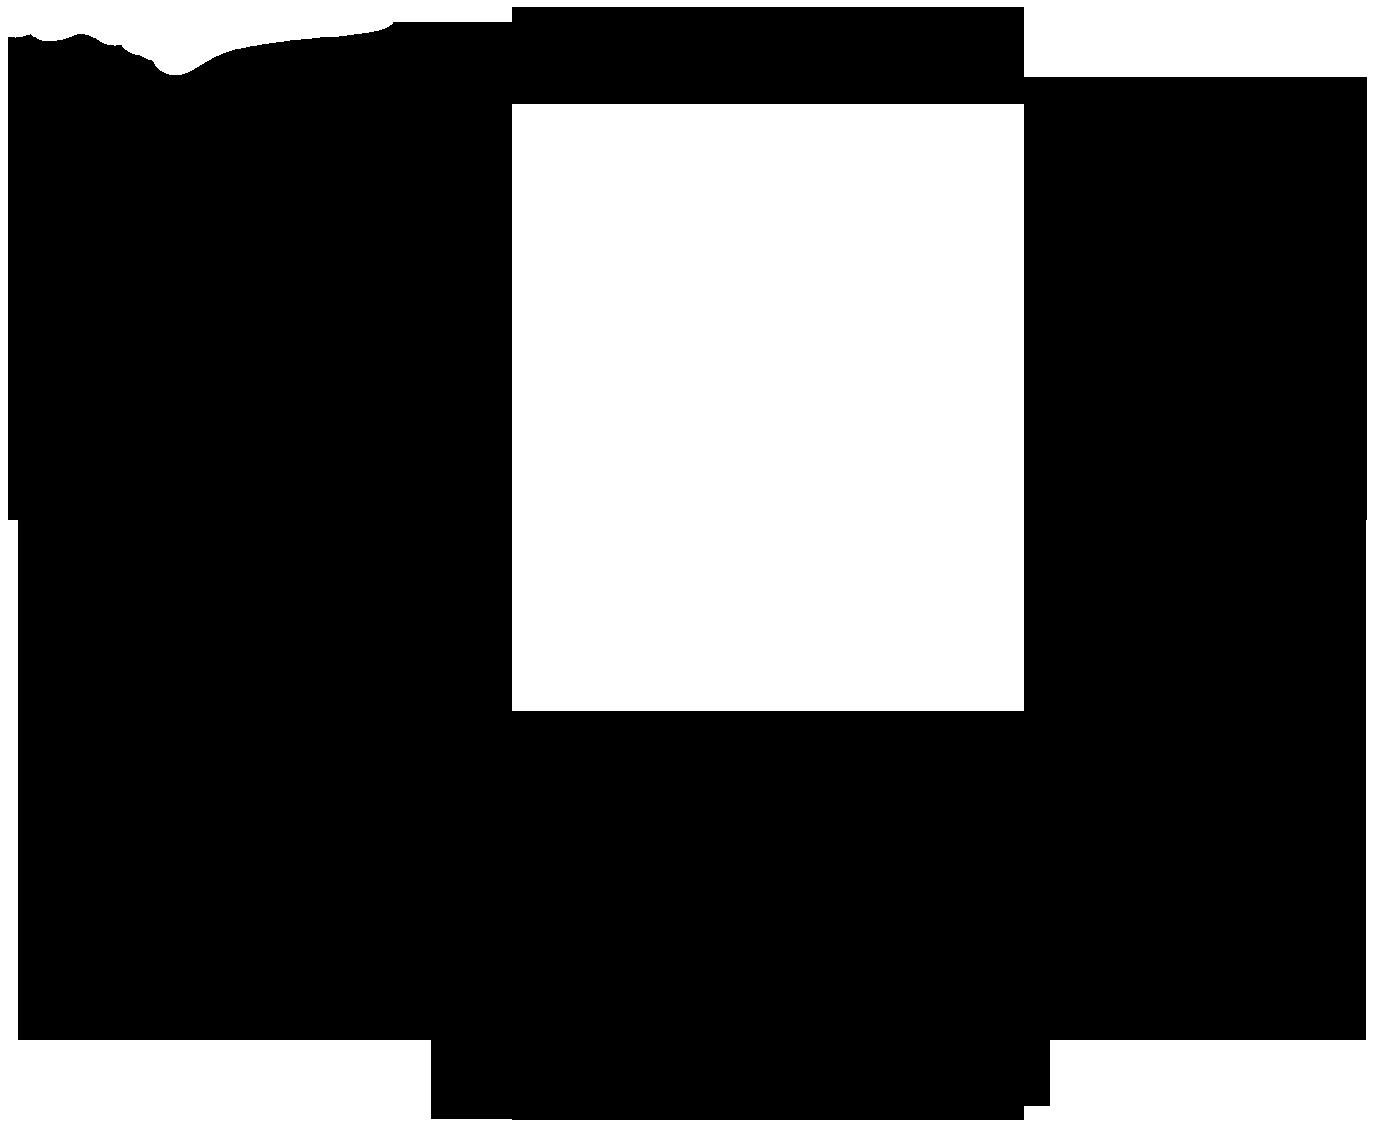 1377x1137 Kindergarten Kids Clipart Black And White Clipart Panda